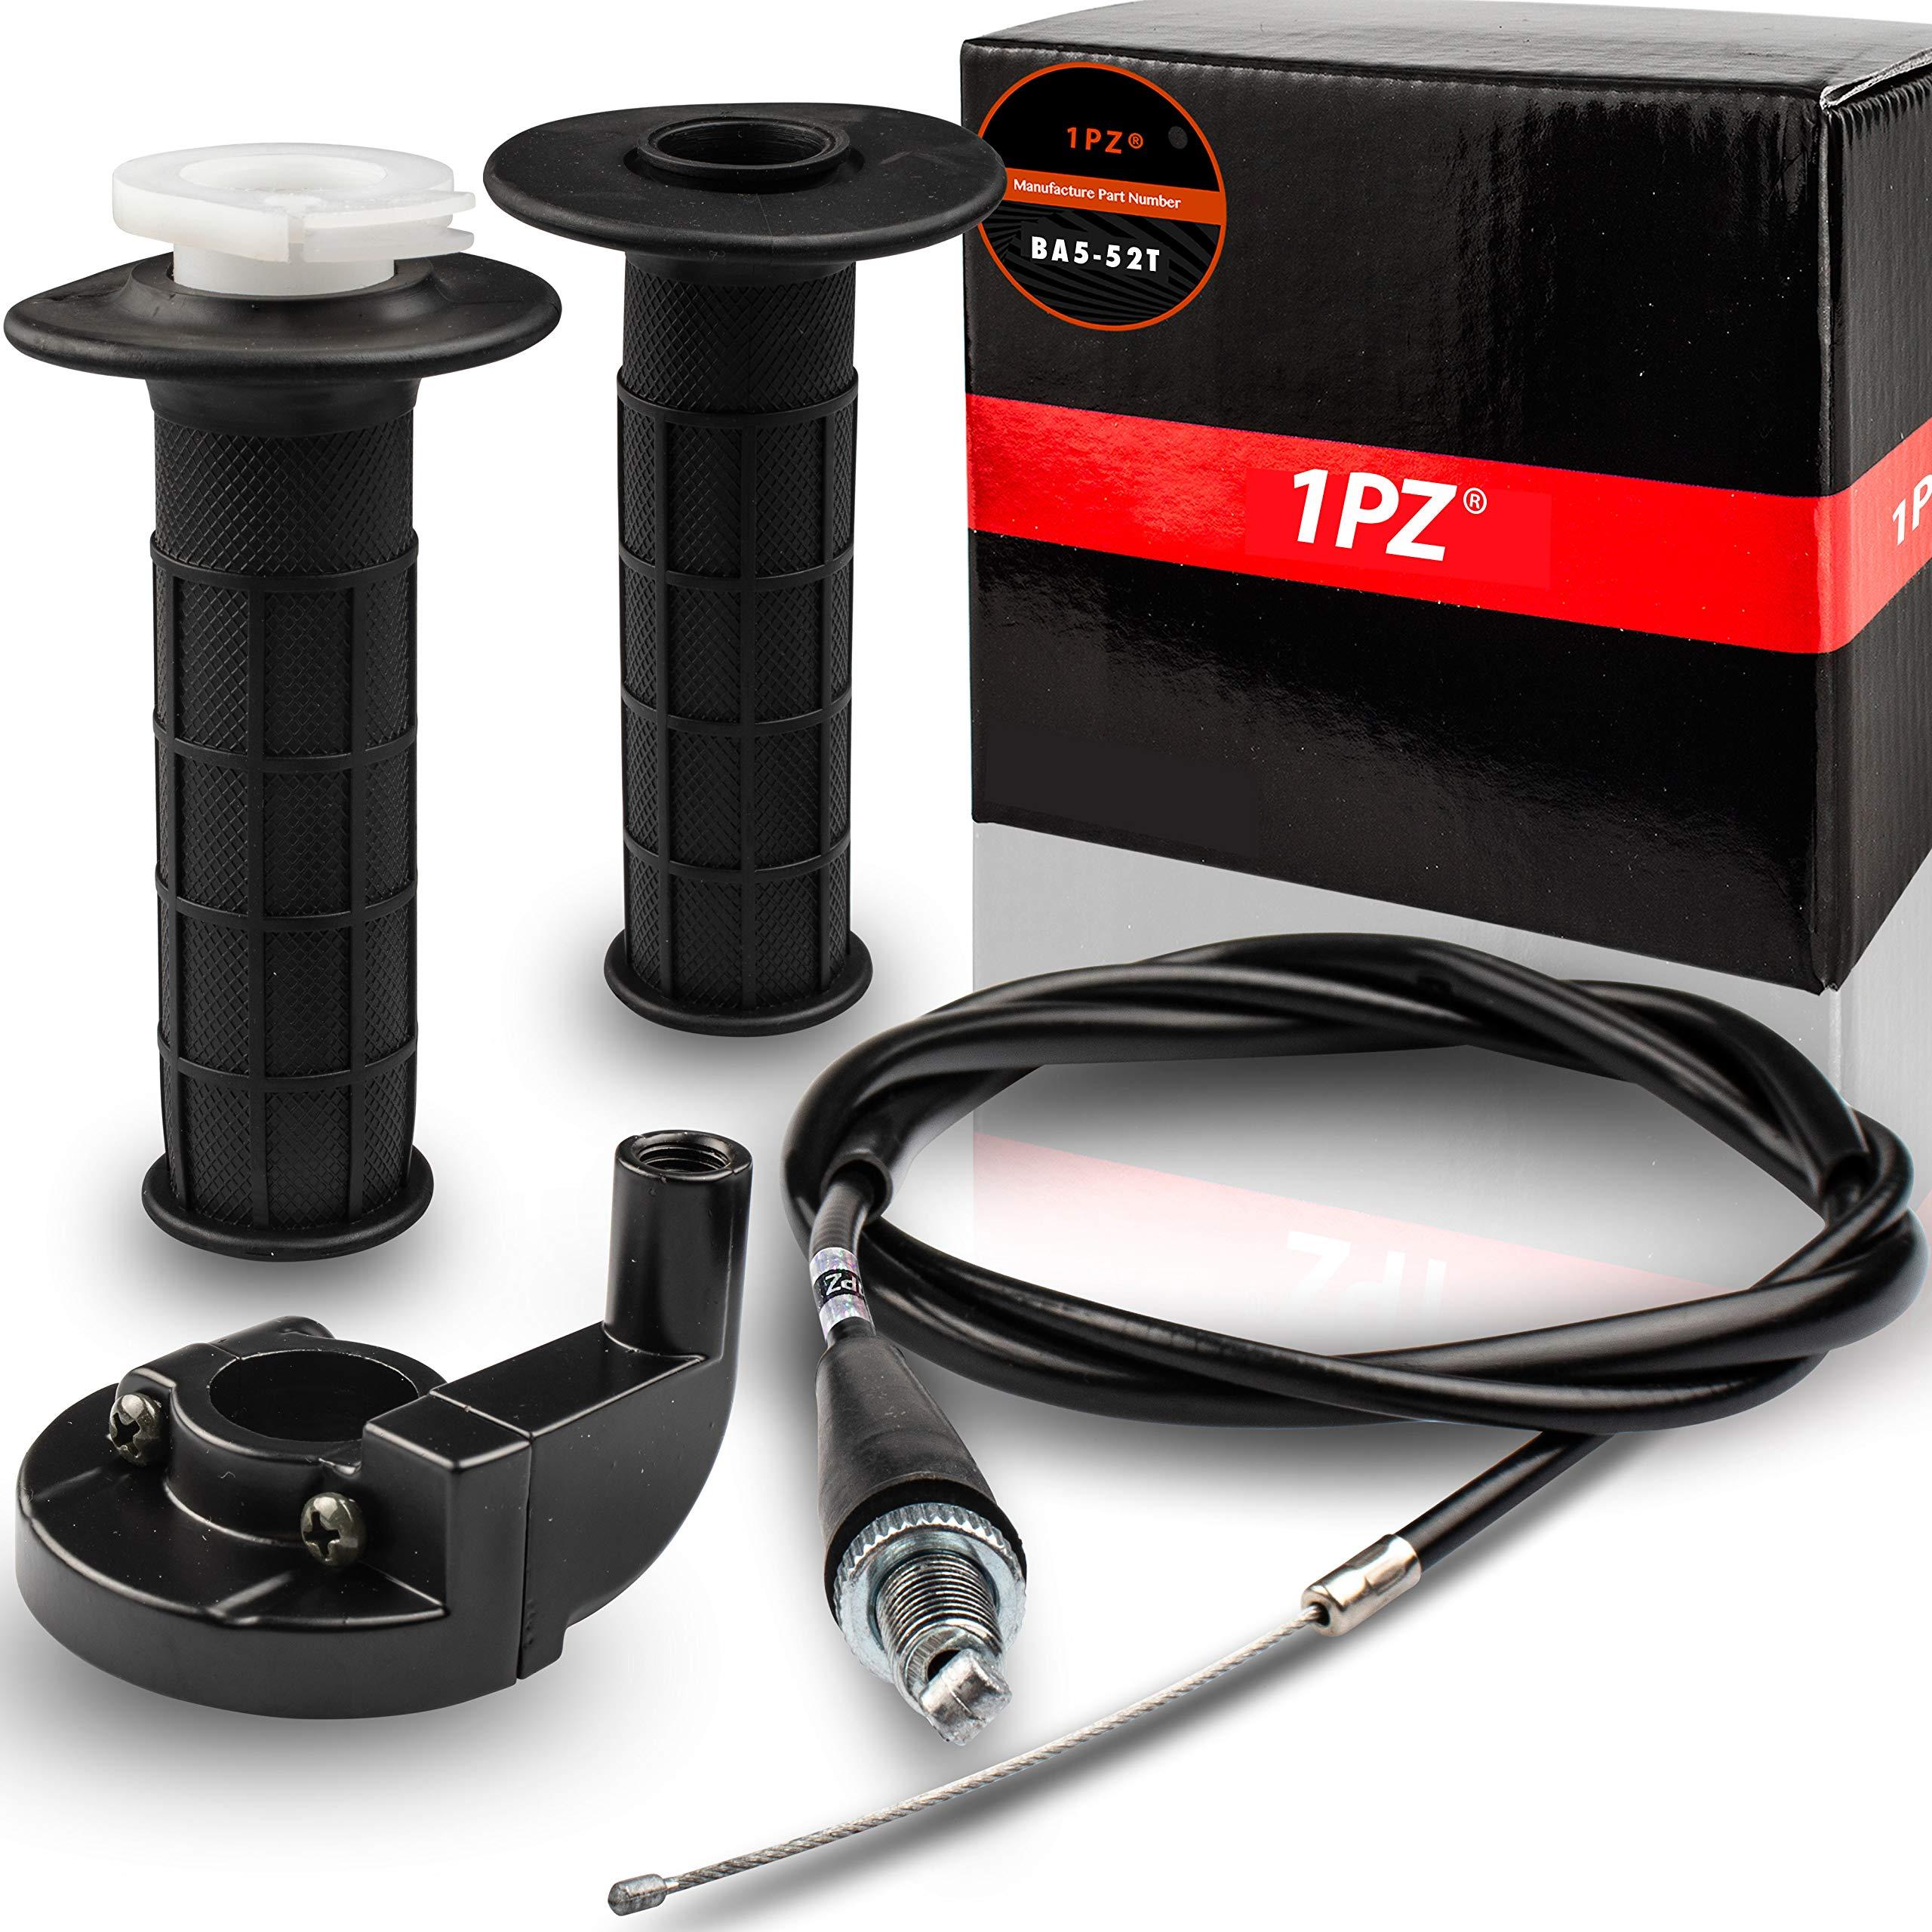 1PZ BA5-52T Throttle Handle and Grip Cable for Mini Baja Mb165 Mb200 5.5/6.5hp 196cc 200cc Doodlebug Bike